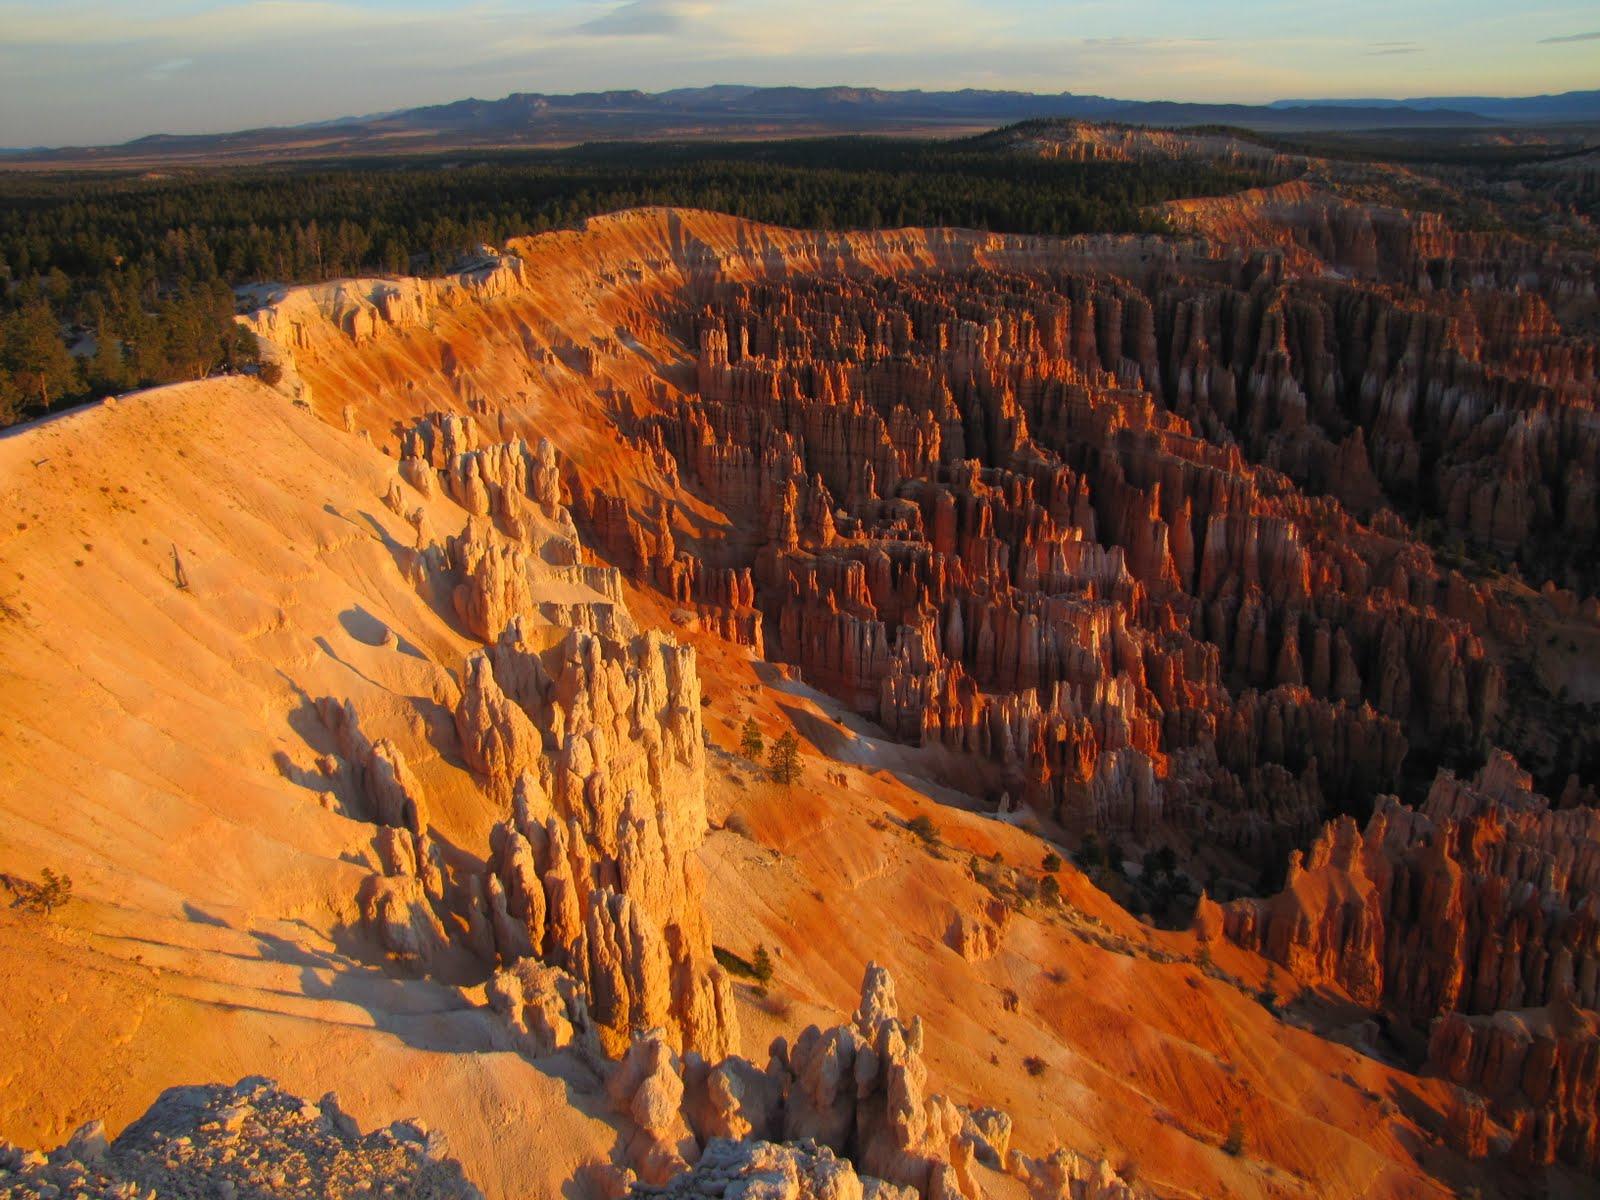 Bryce Canyon at 6:43am, the Sunrise